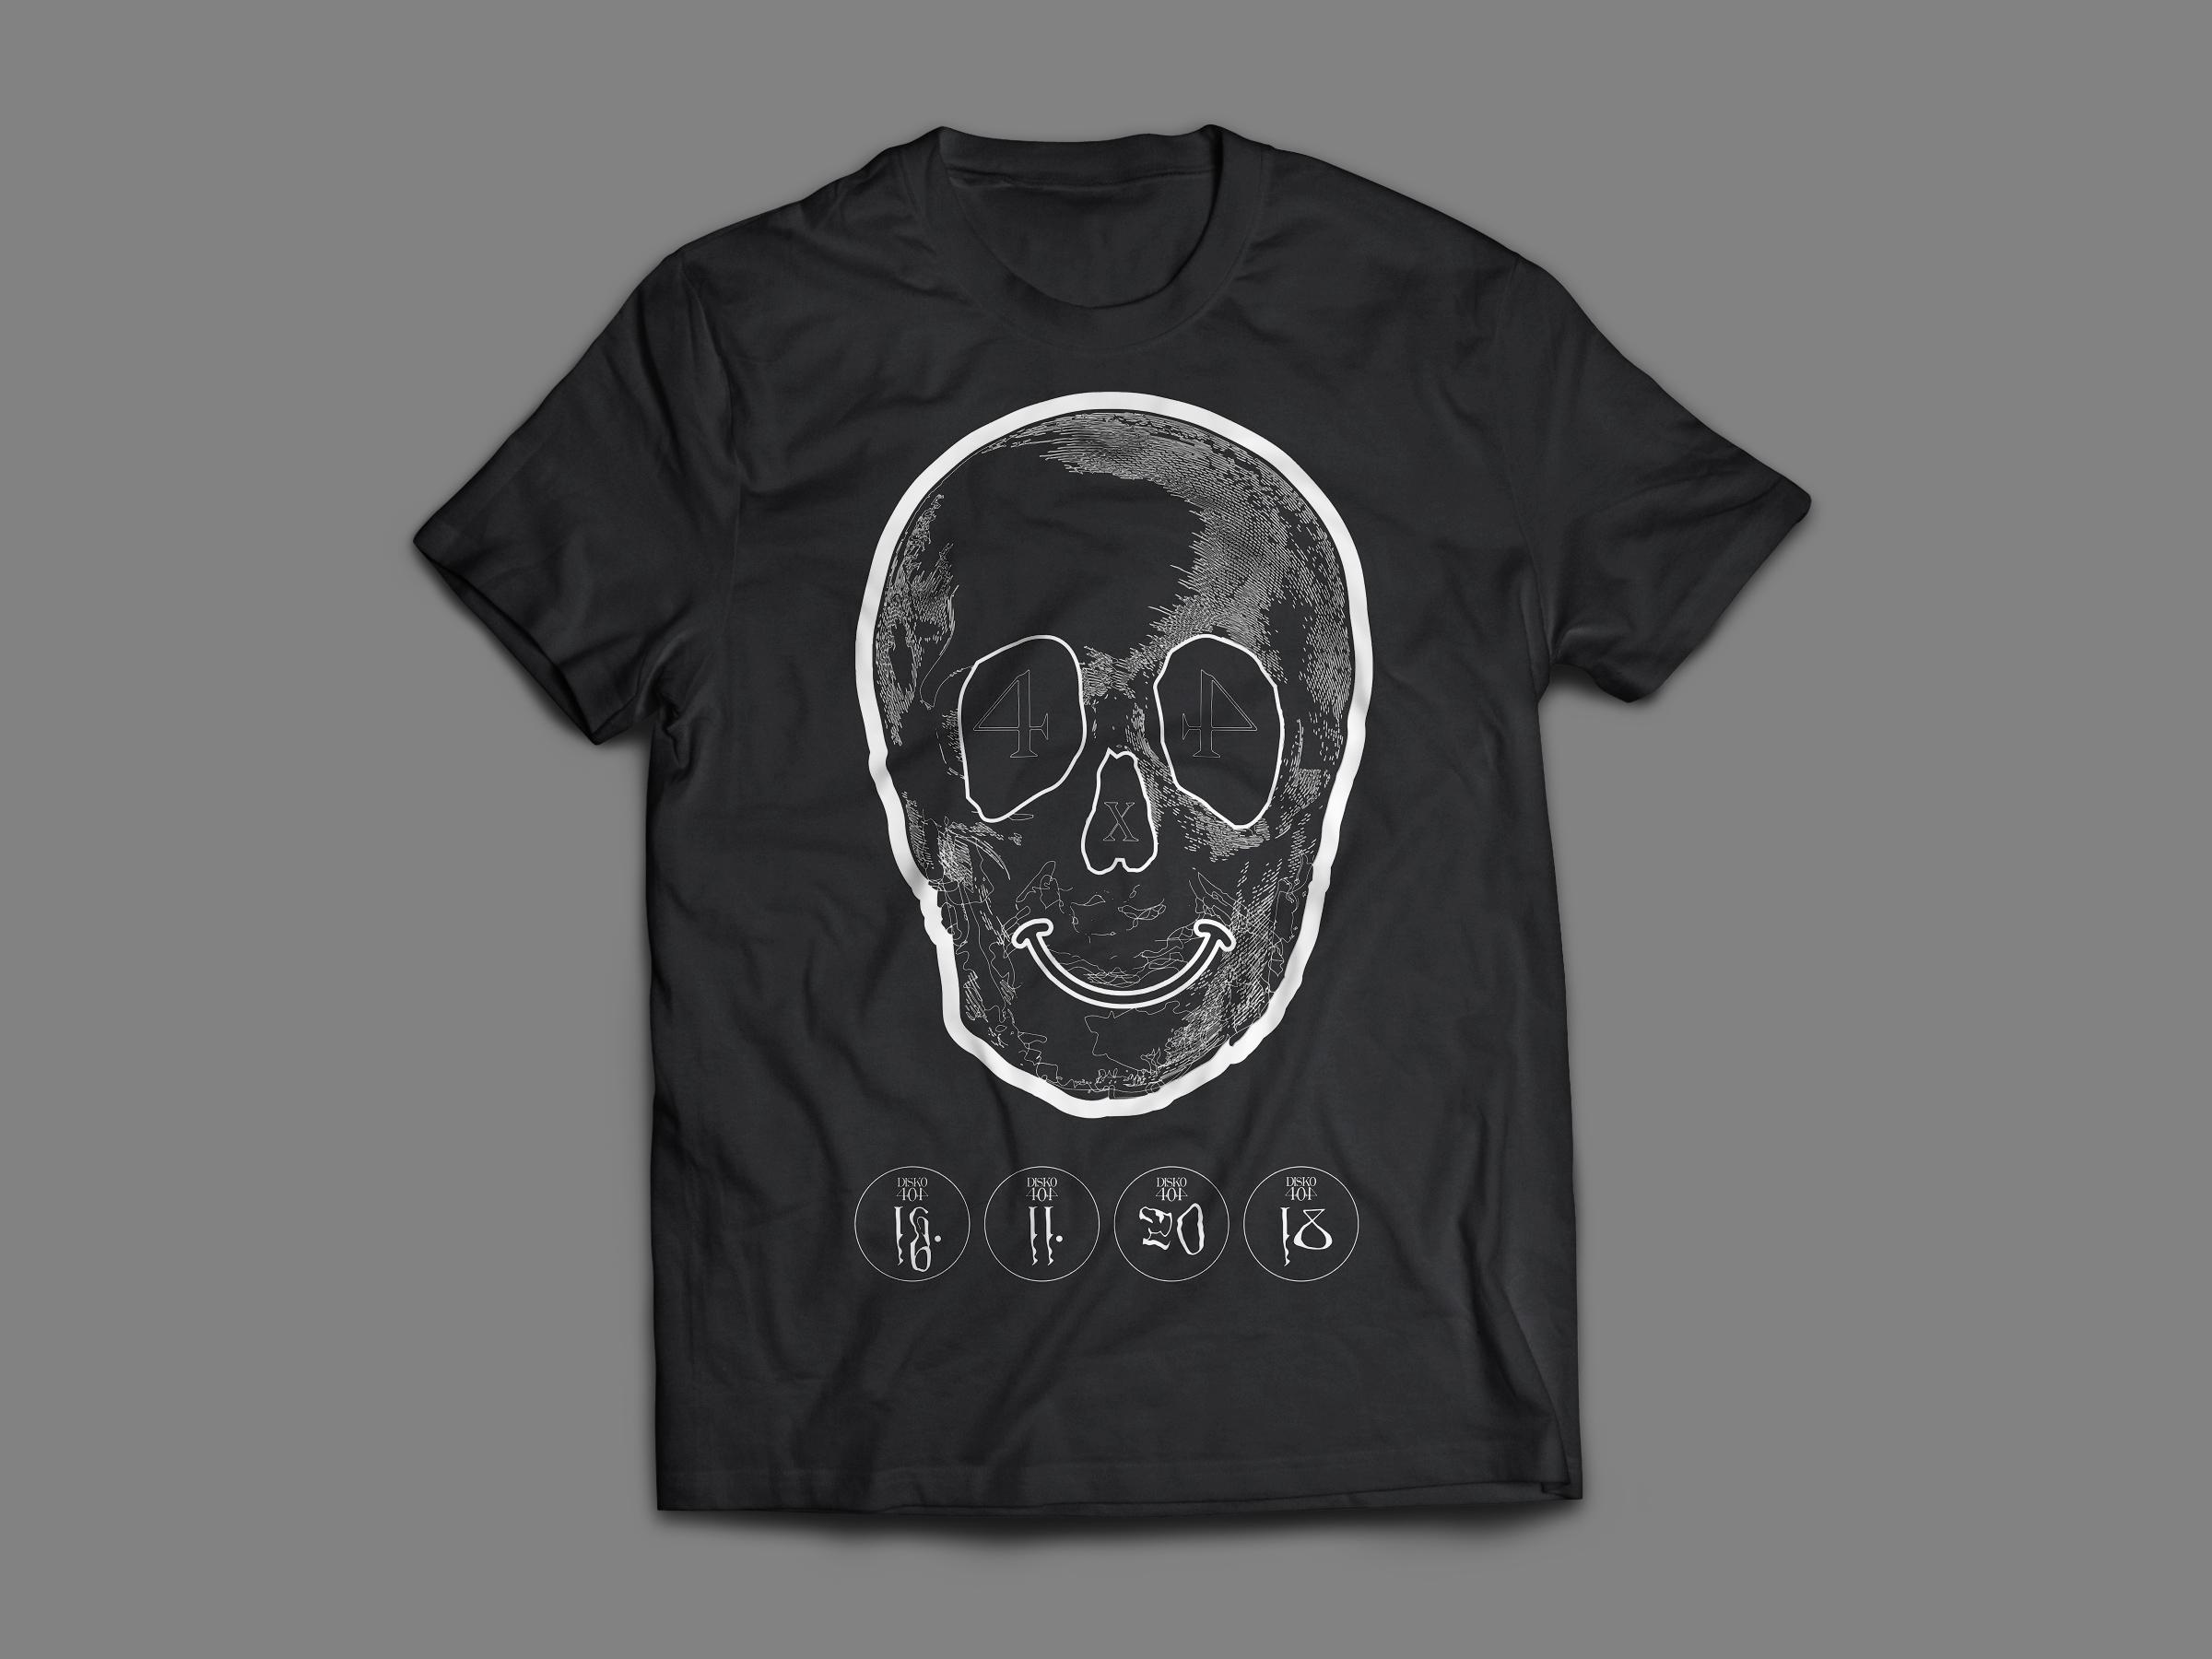 T-Shirt-black-complex-skull.jpg